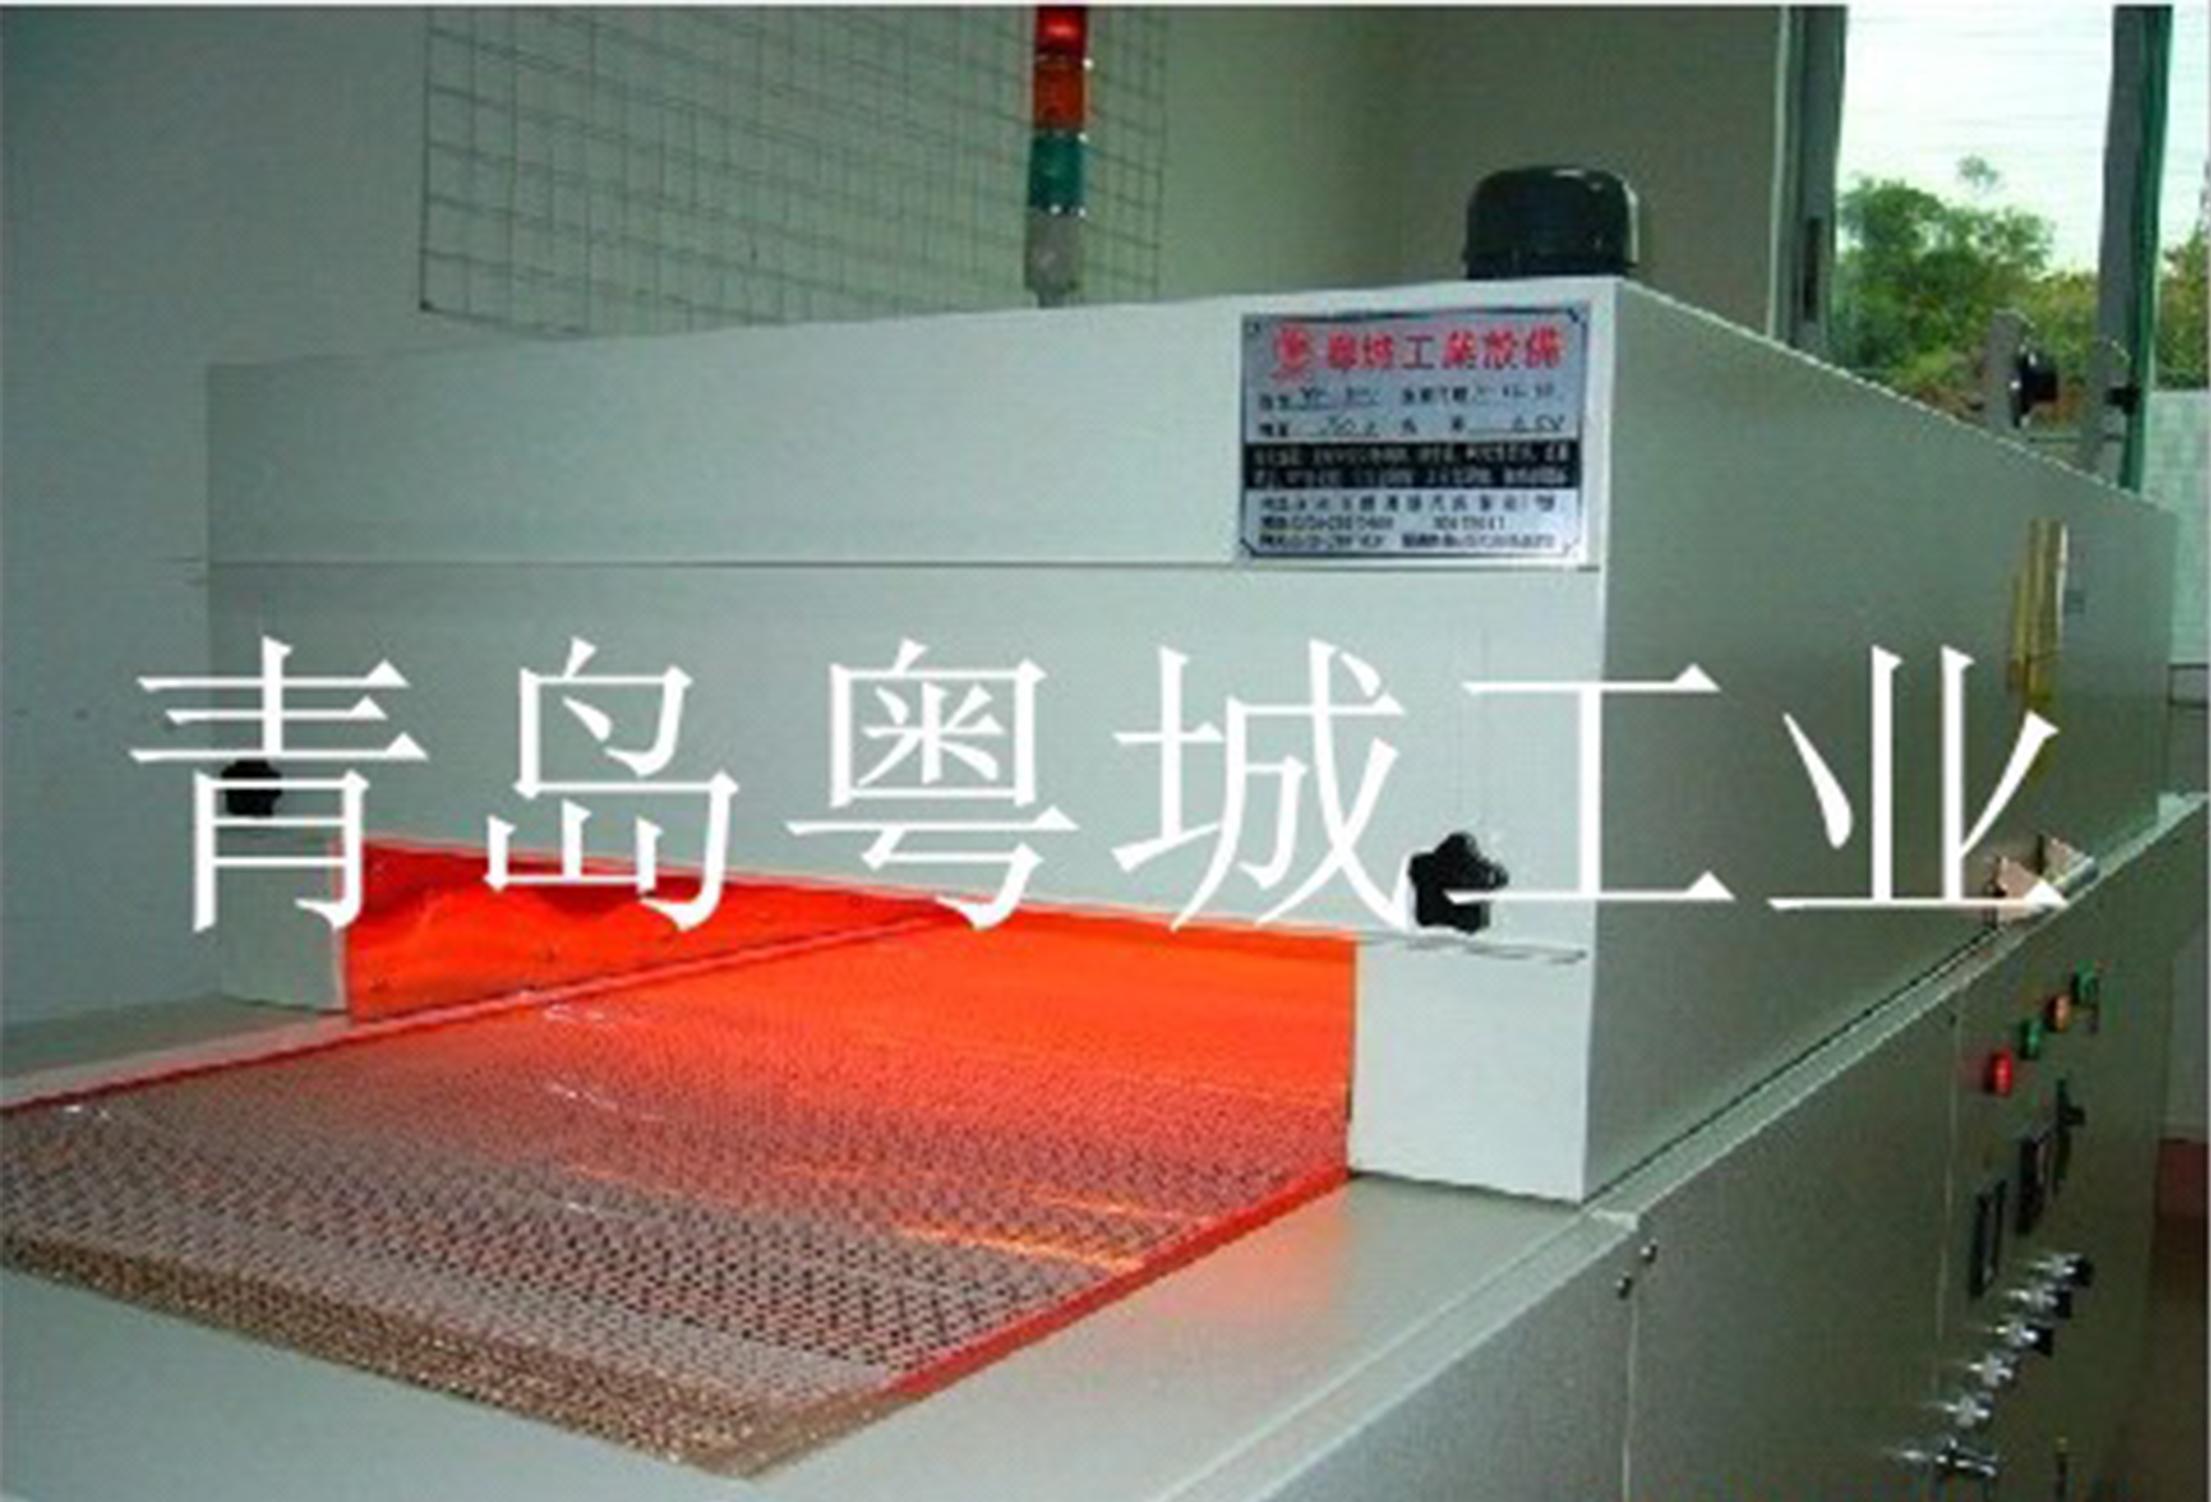 LEDUV固化机与传统固化机相比有哪些优点?